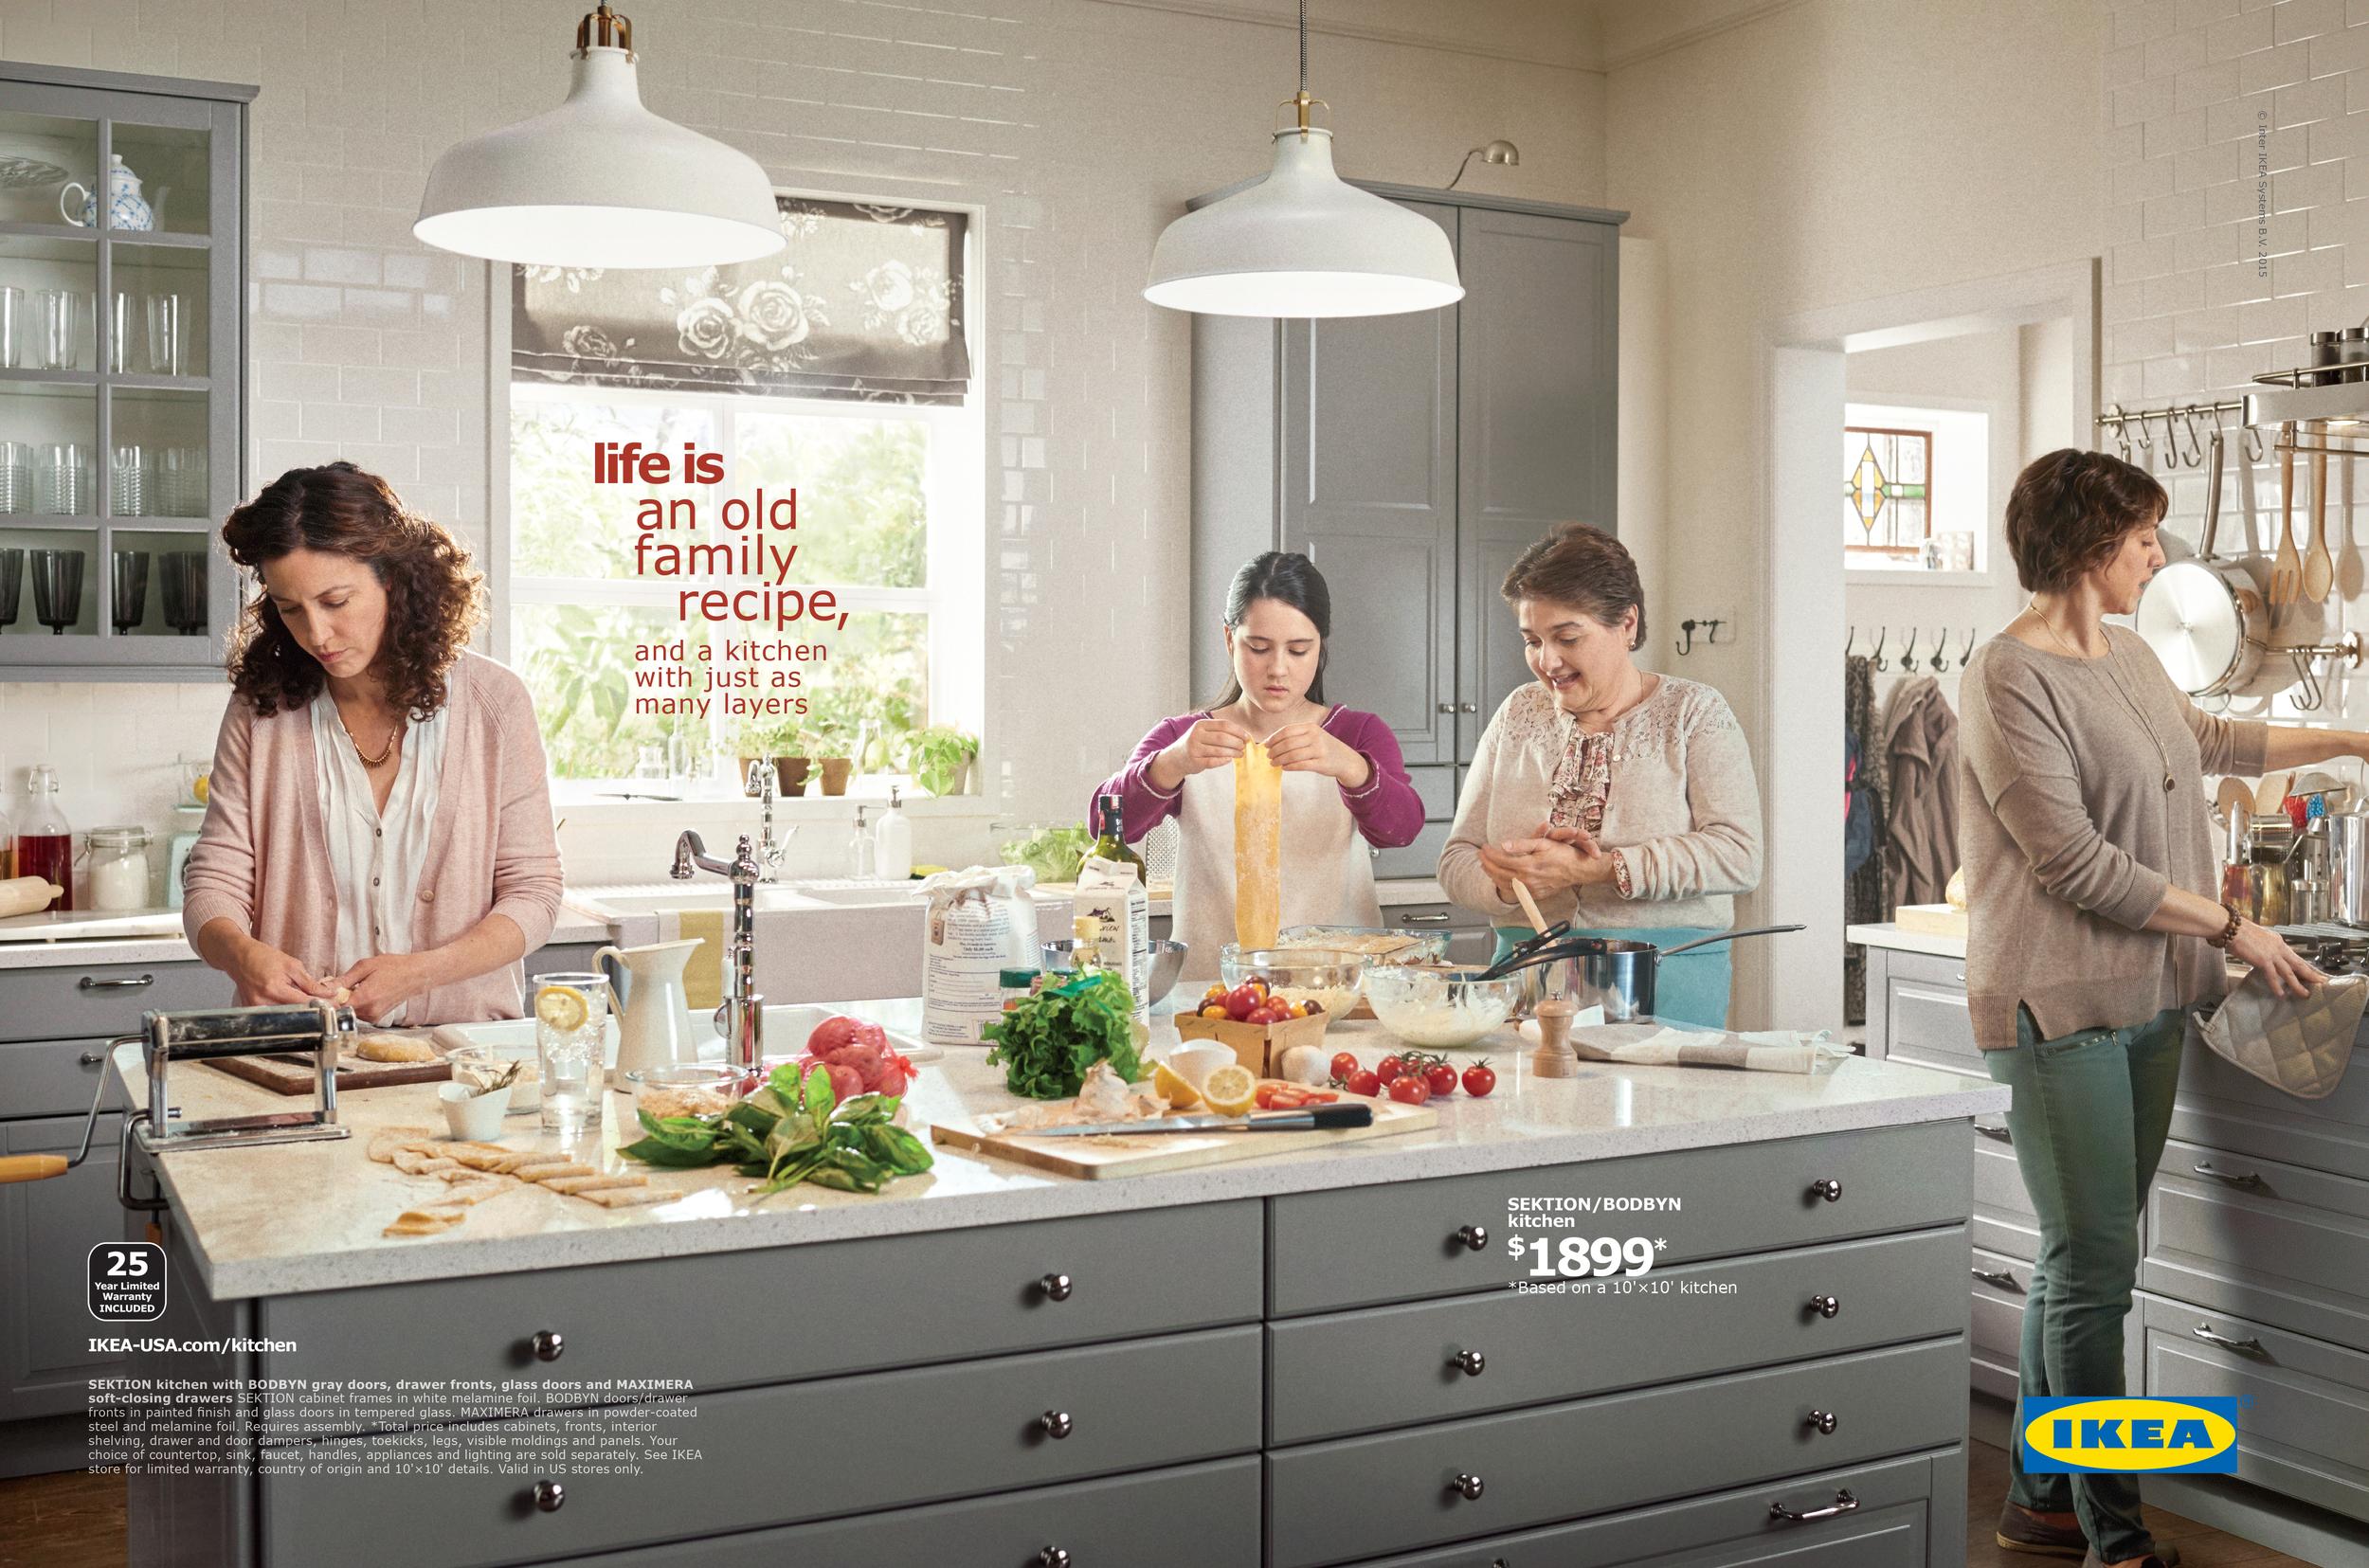 IKEA SEKTION Family Recipe Spread FINAL APPROVED 1.22.15 copy.jpg